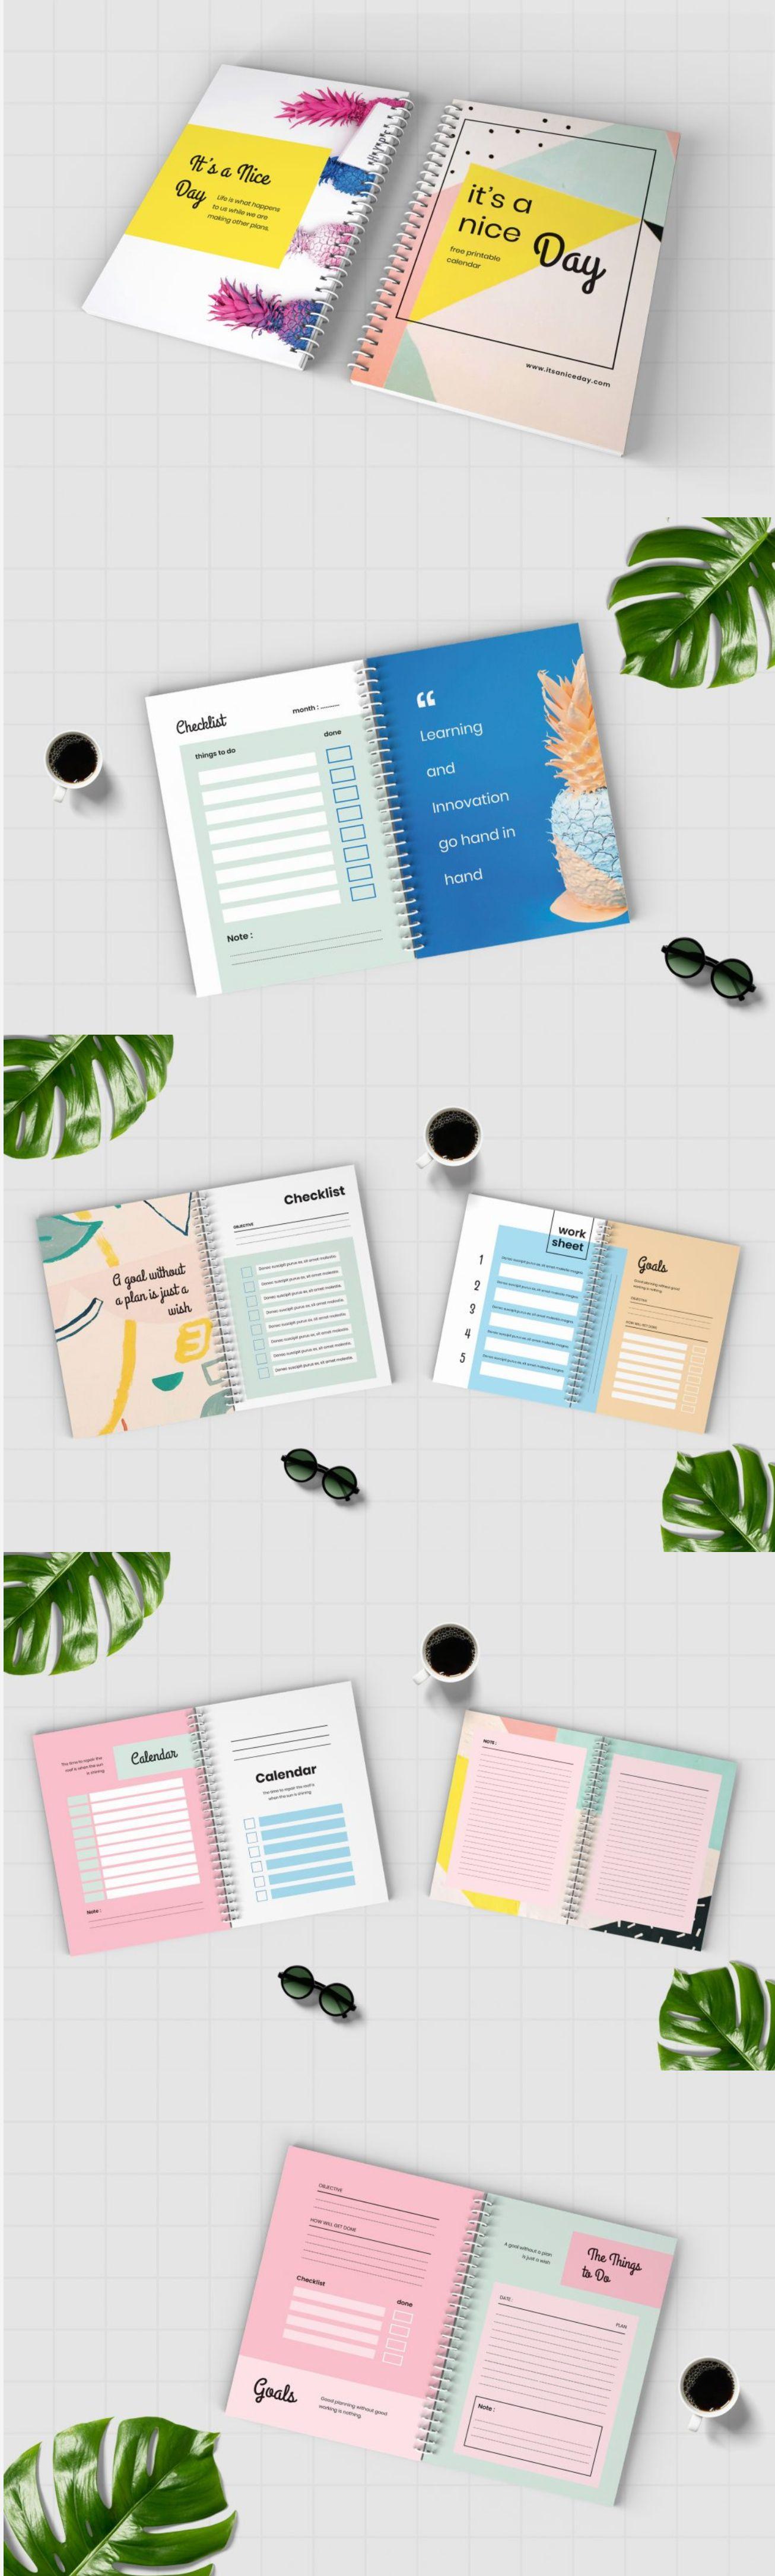 Worksheet Daily Planner Book